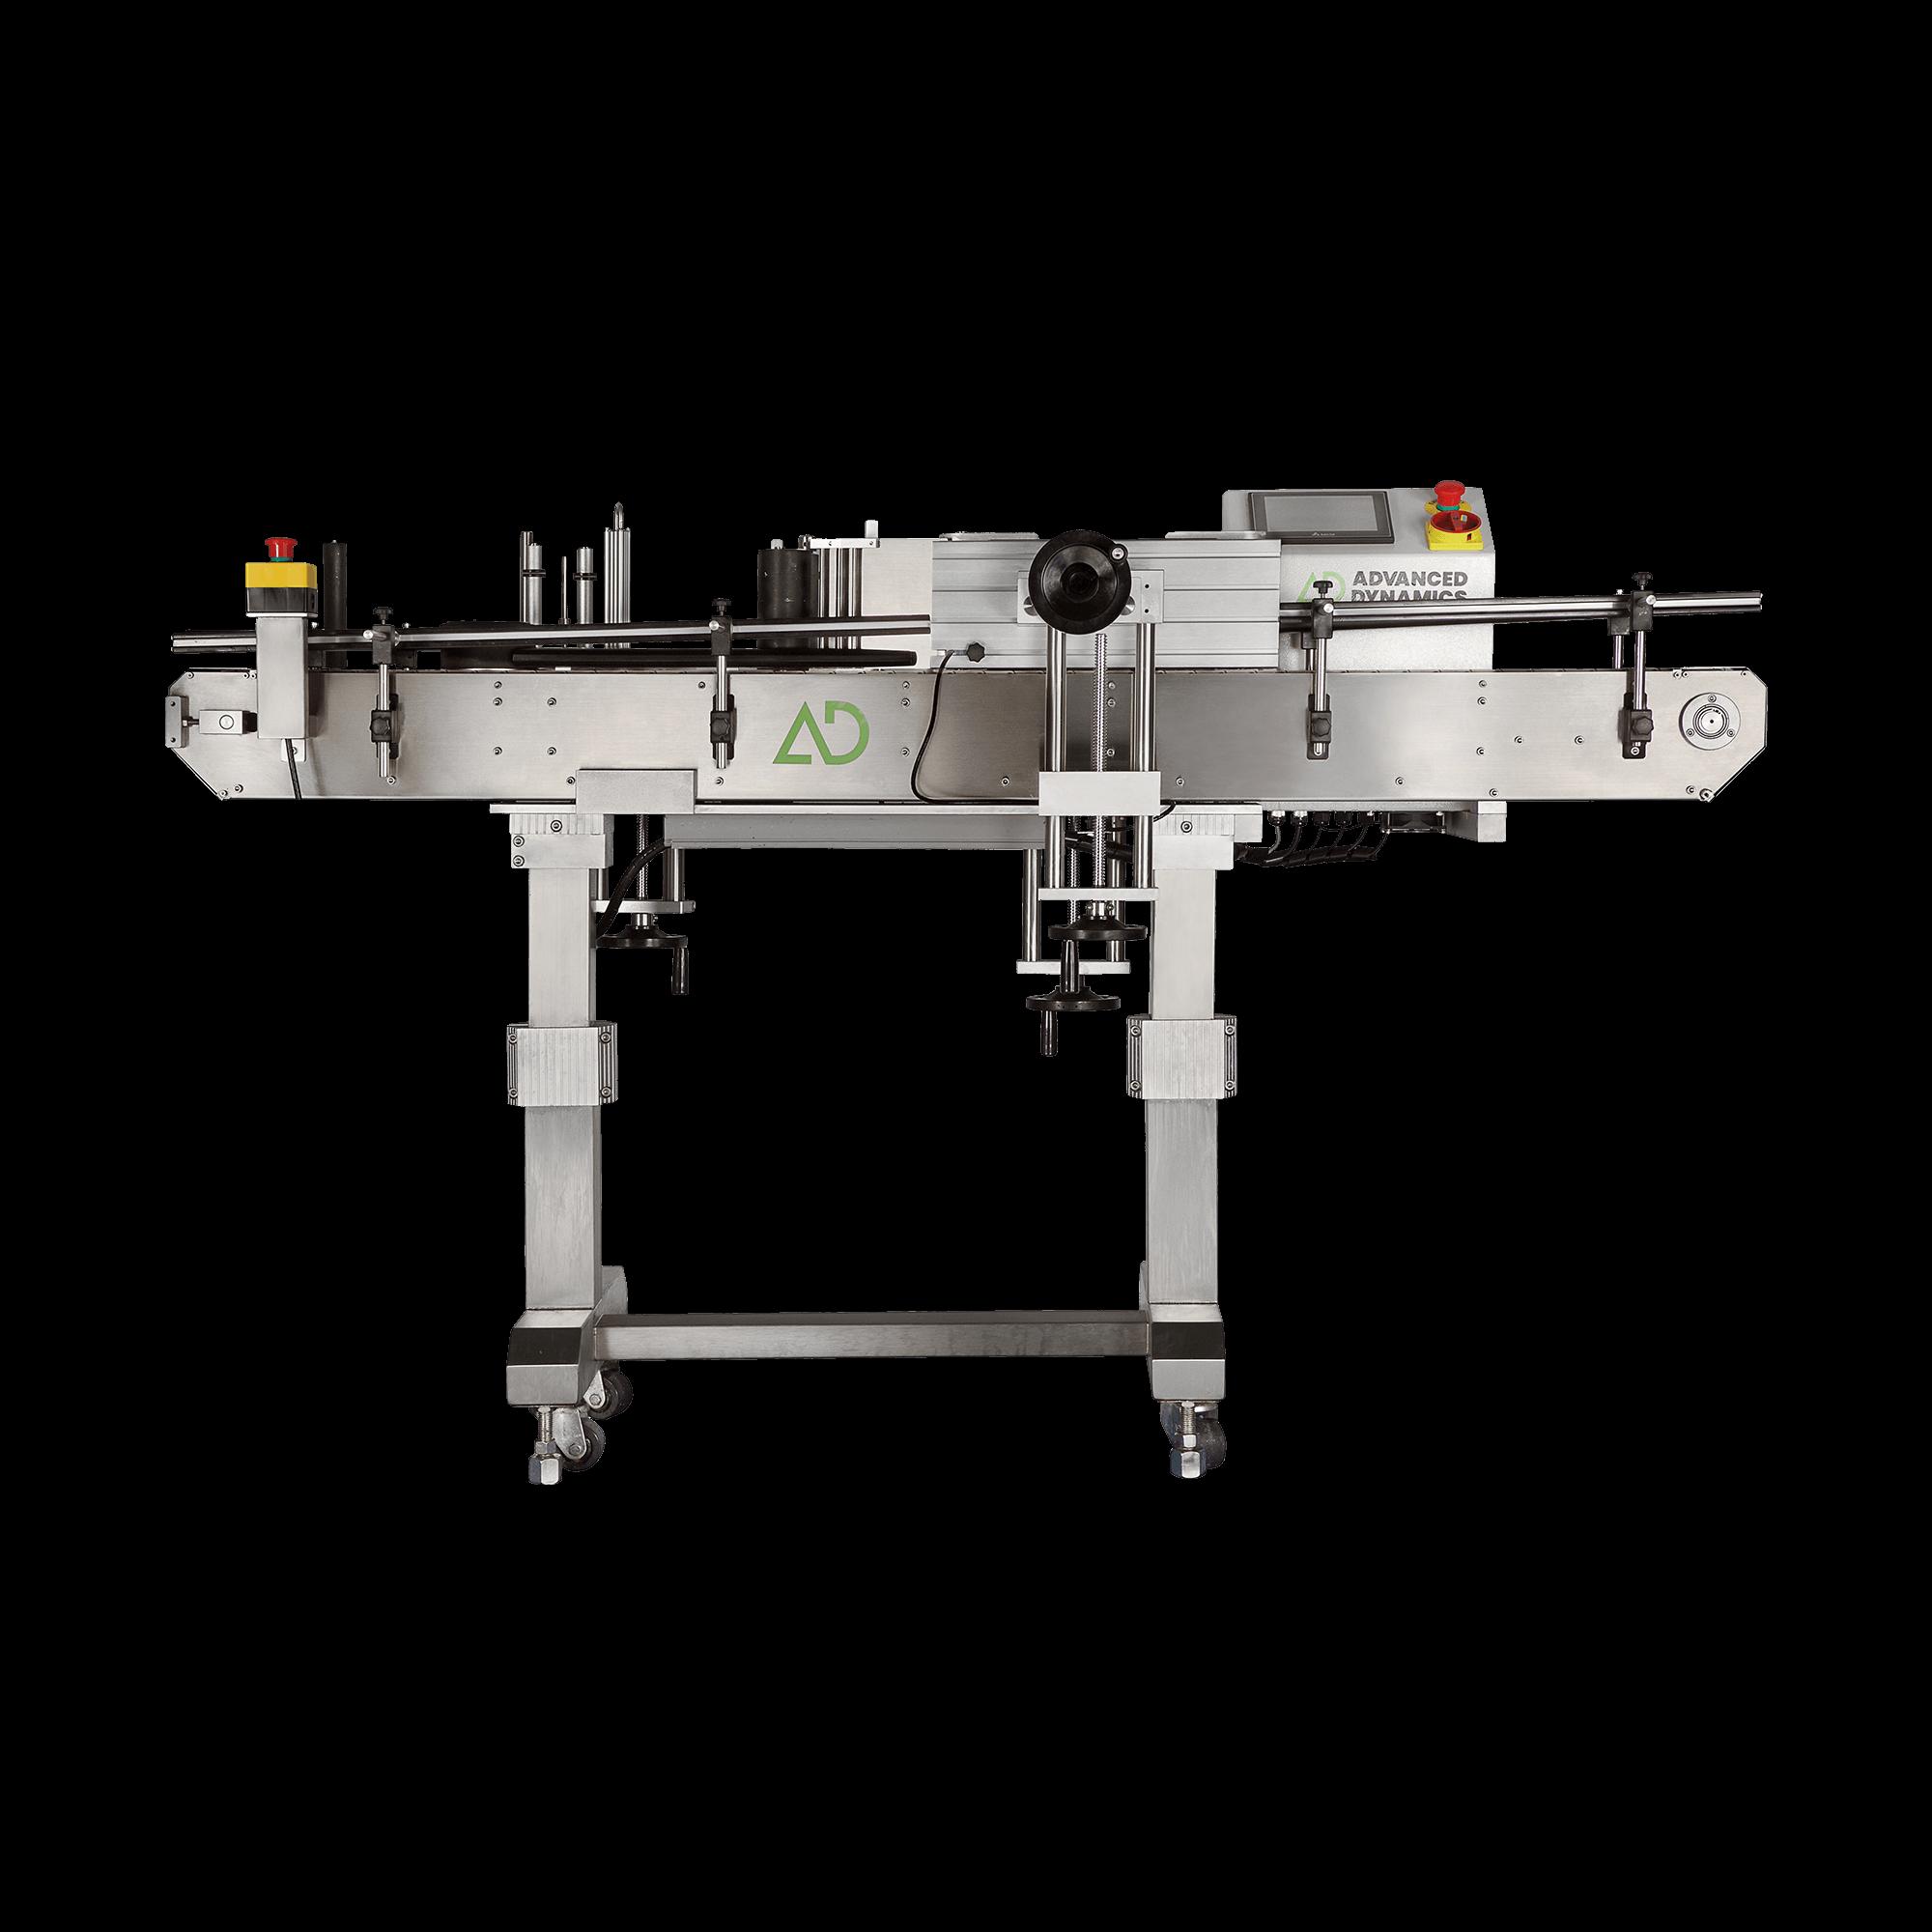 PL-501 Wraparound Labelling System